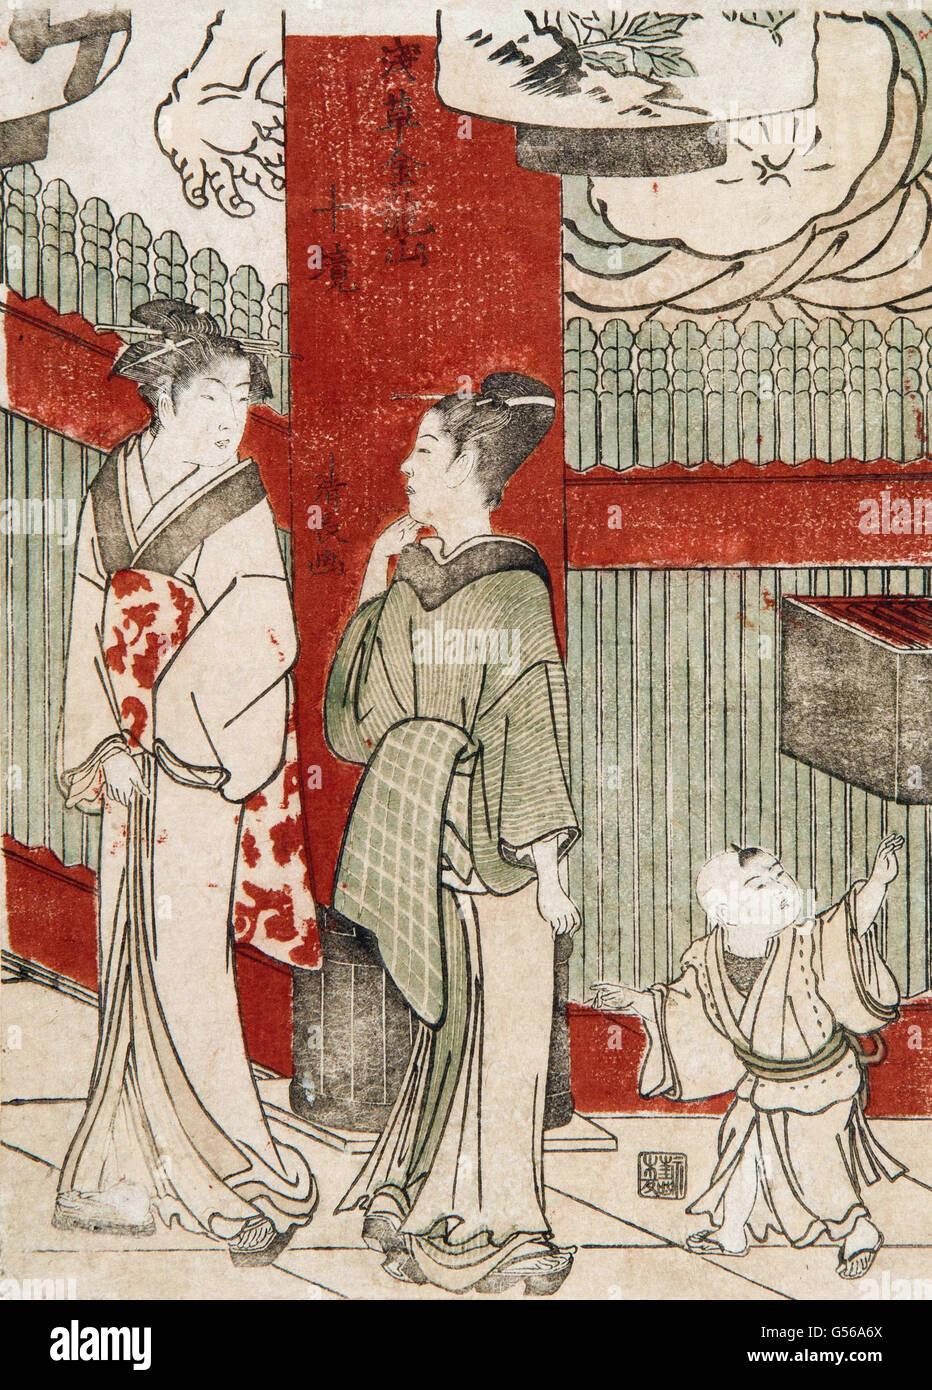 Torii Kiyonaga - Xilogravura Imagens de Stock